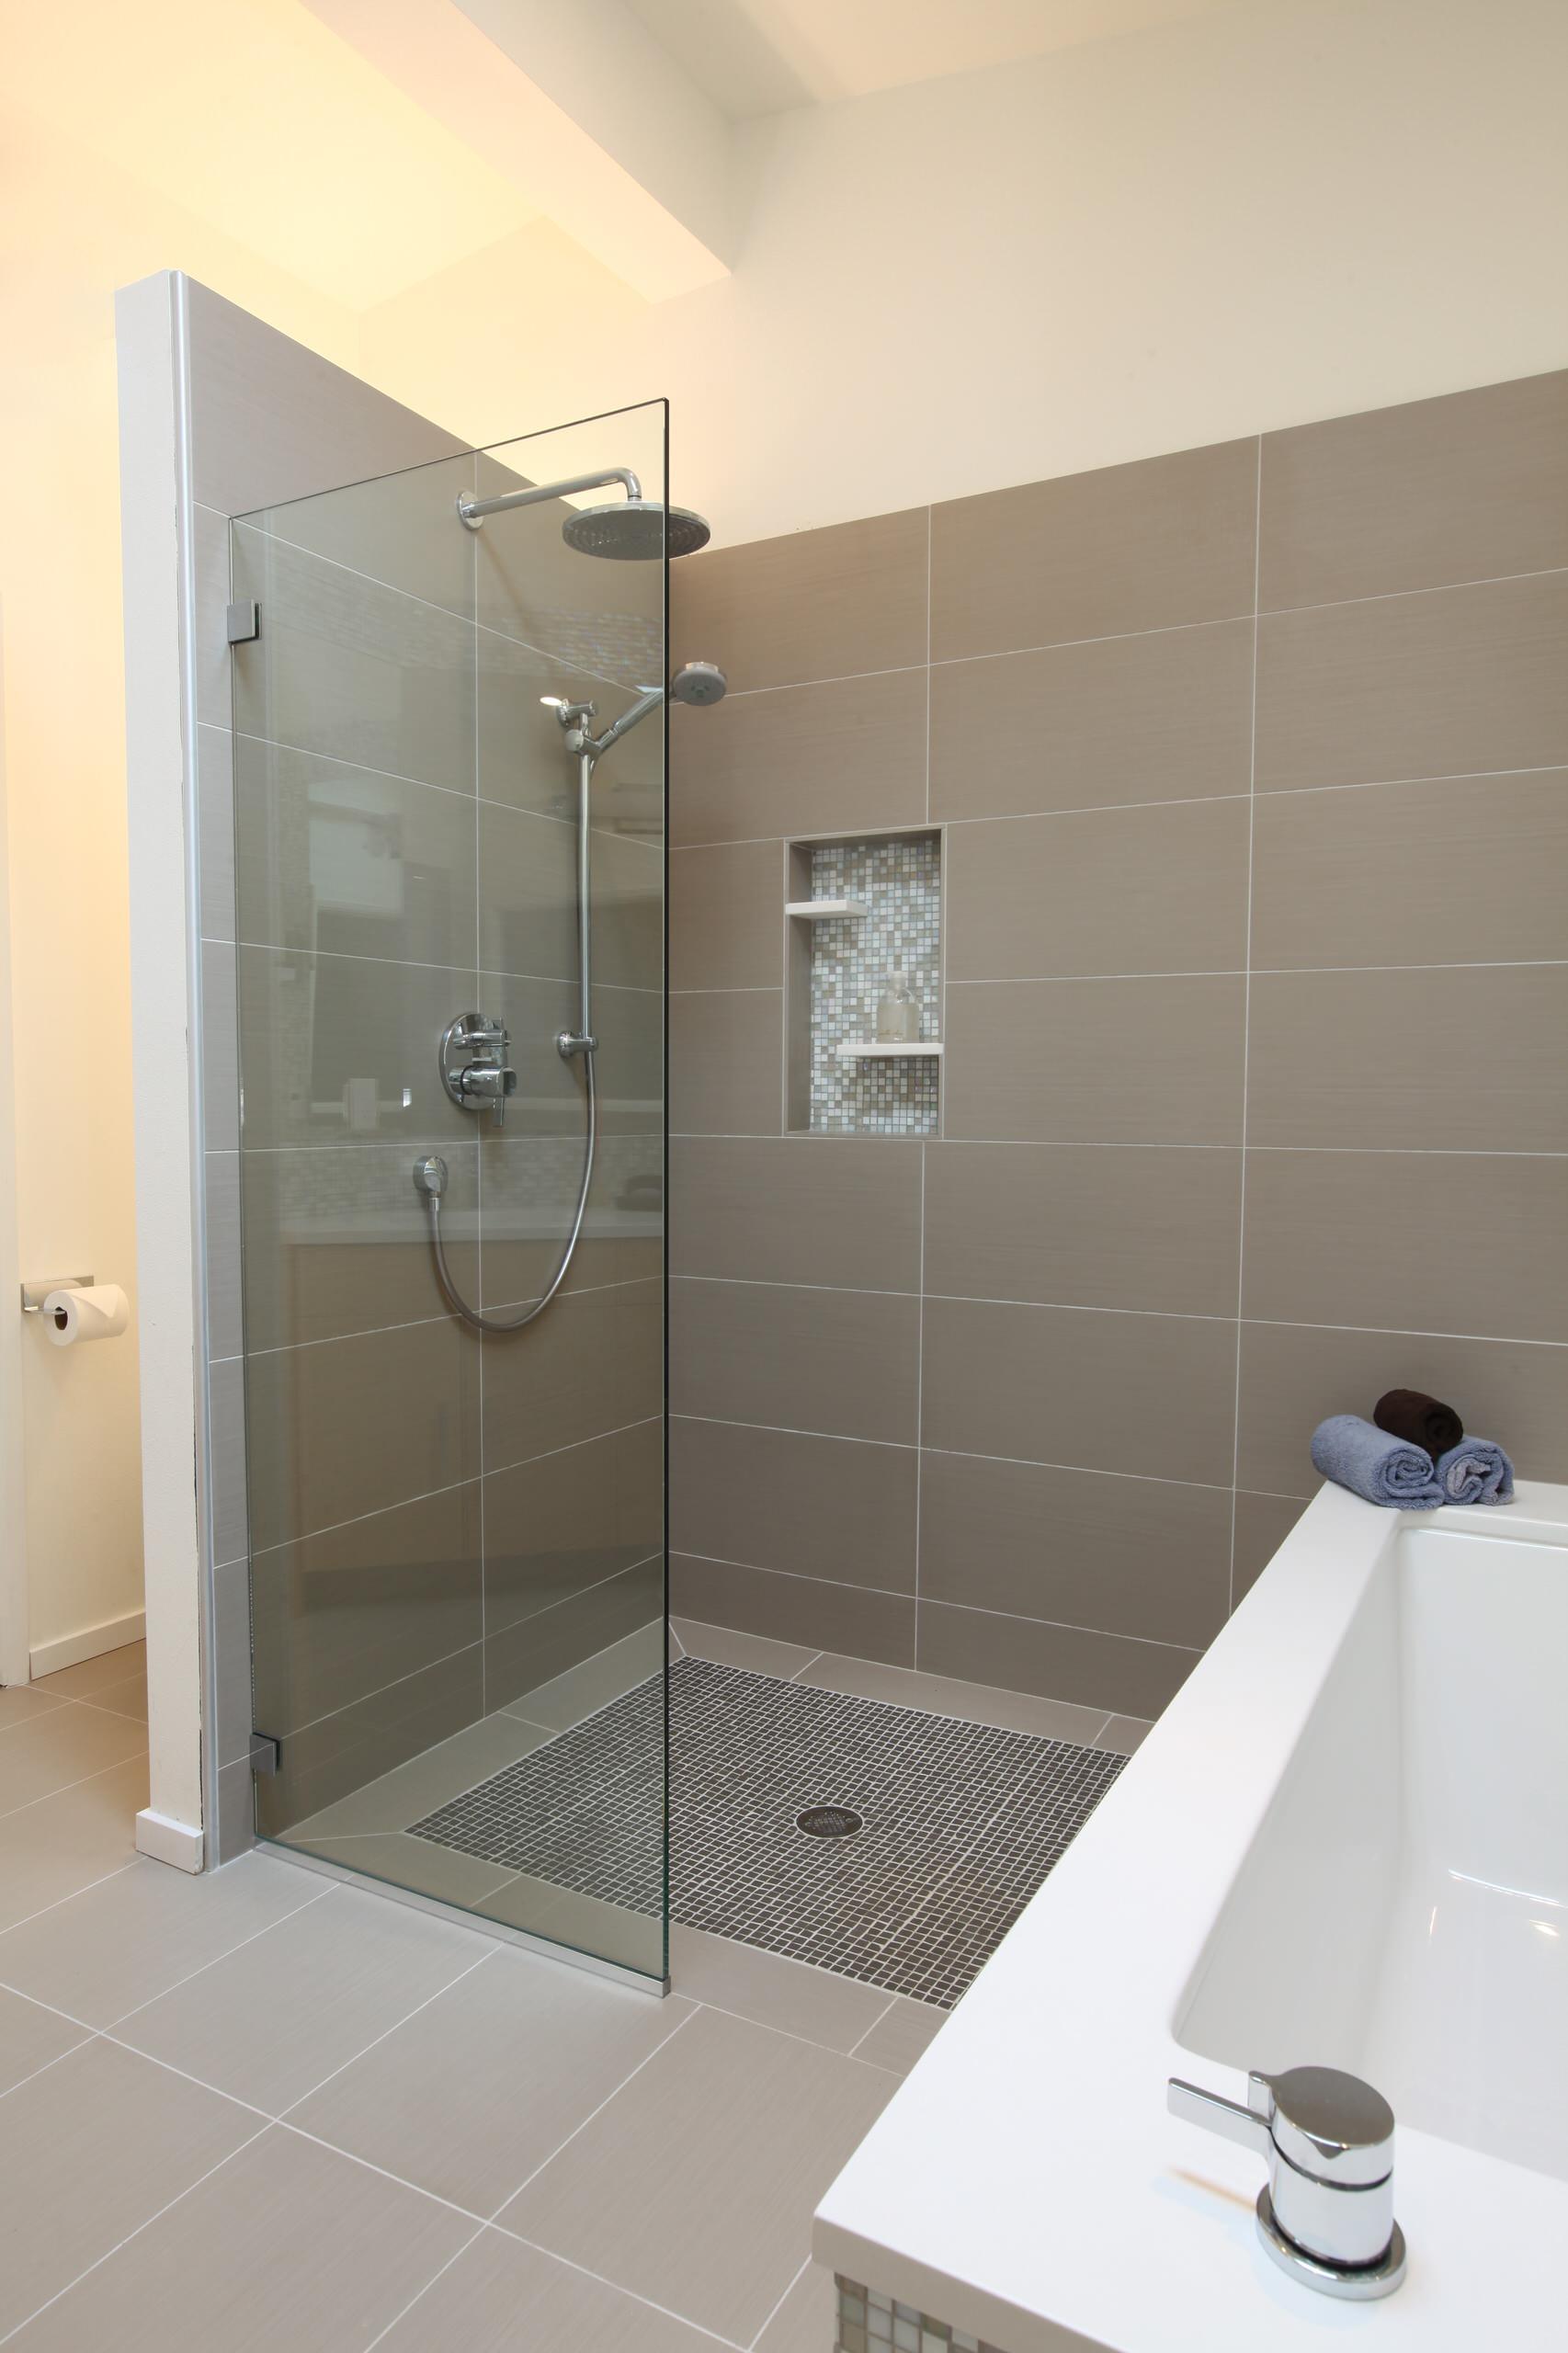 Master Shower After 6 X 4 New Shower Bathroom Ideas Photos Houzz